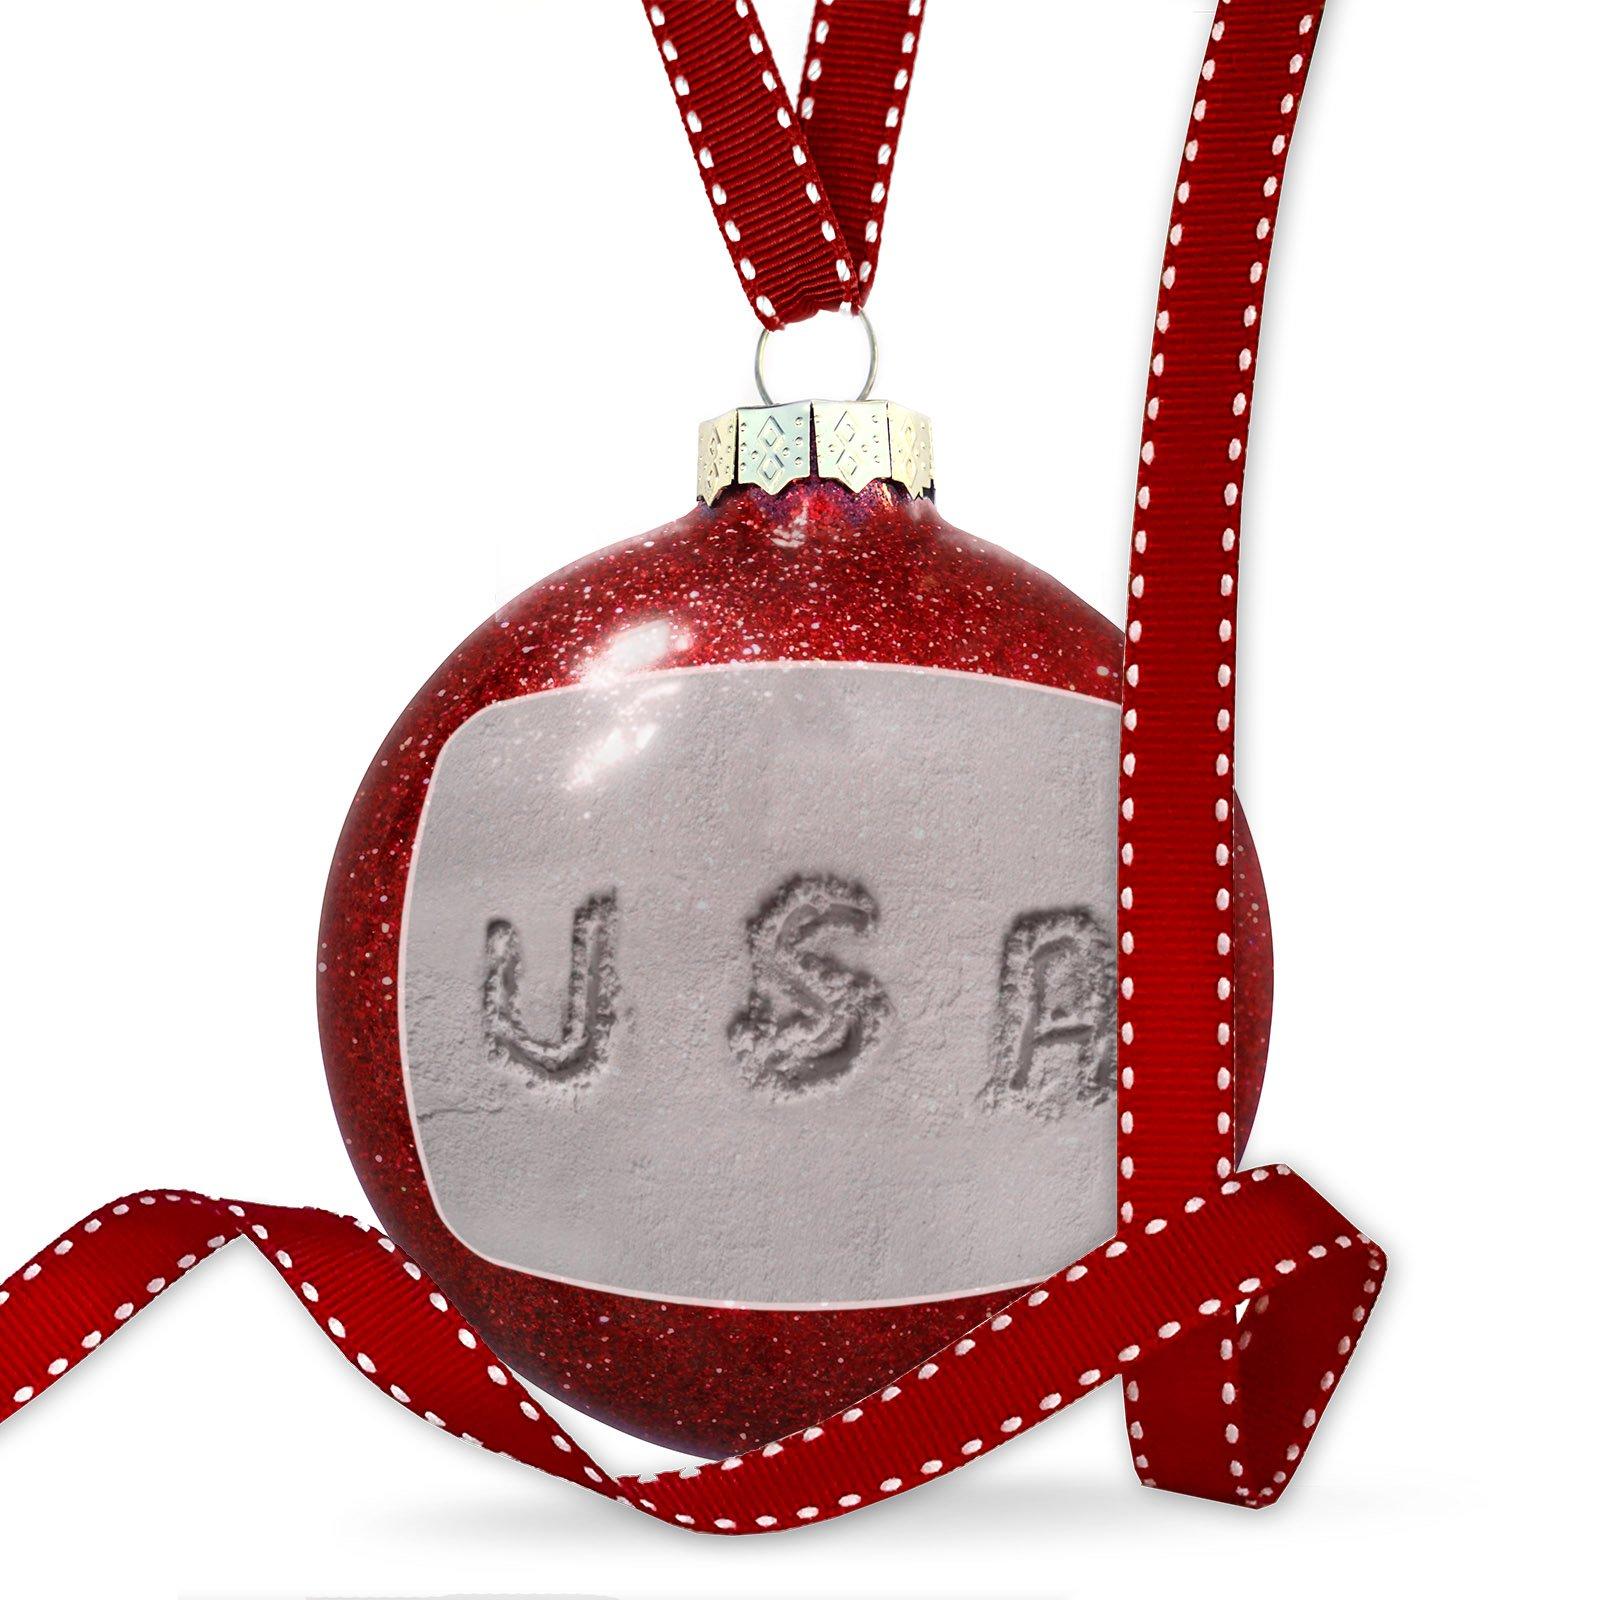 Christmas Decoration United States of America Flour Ornament